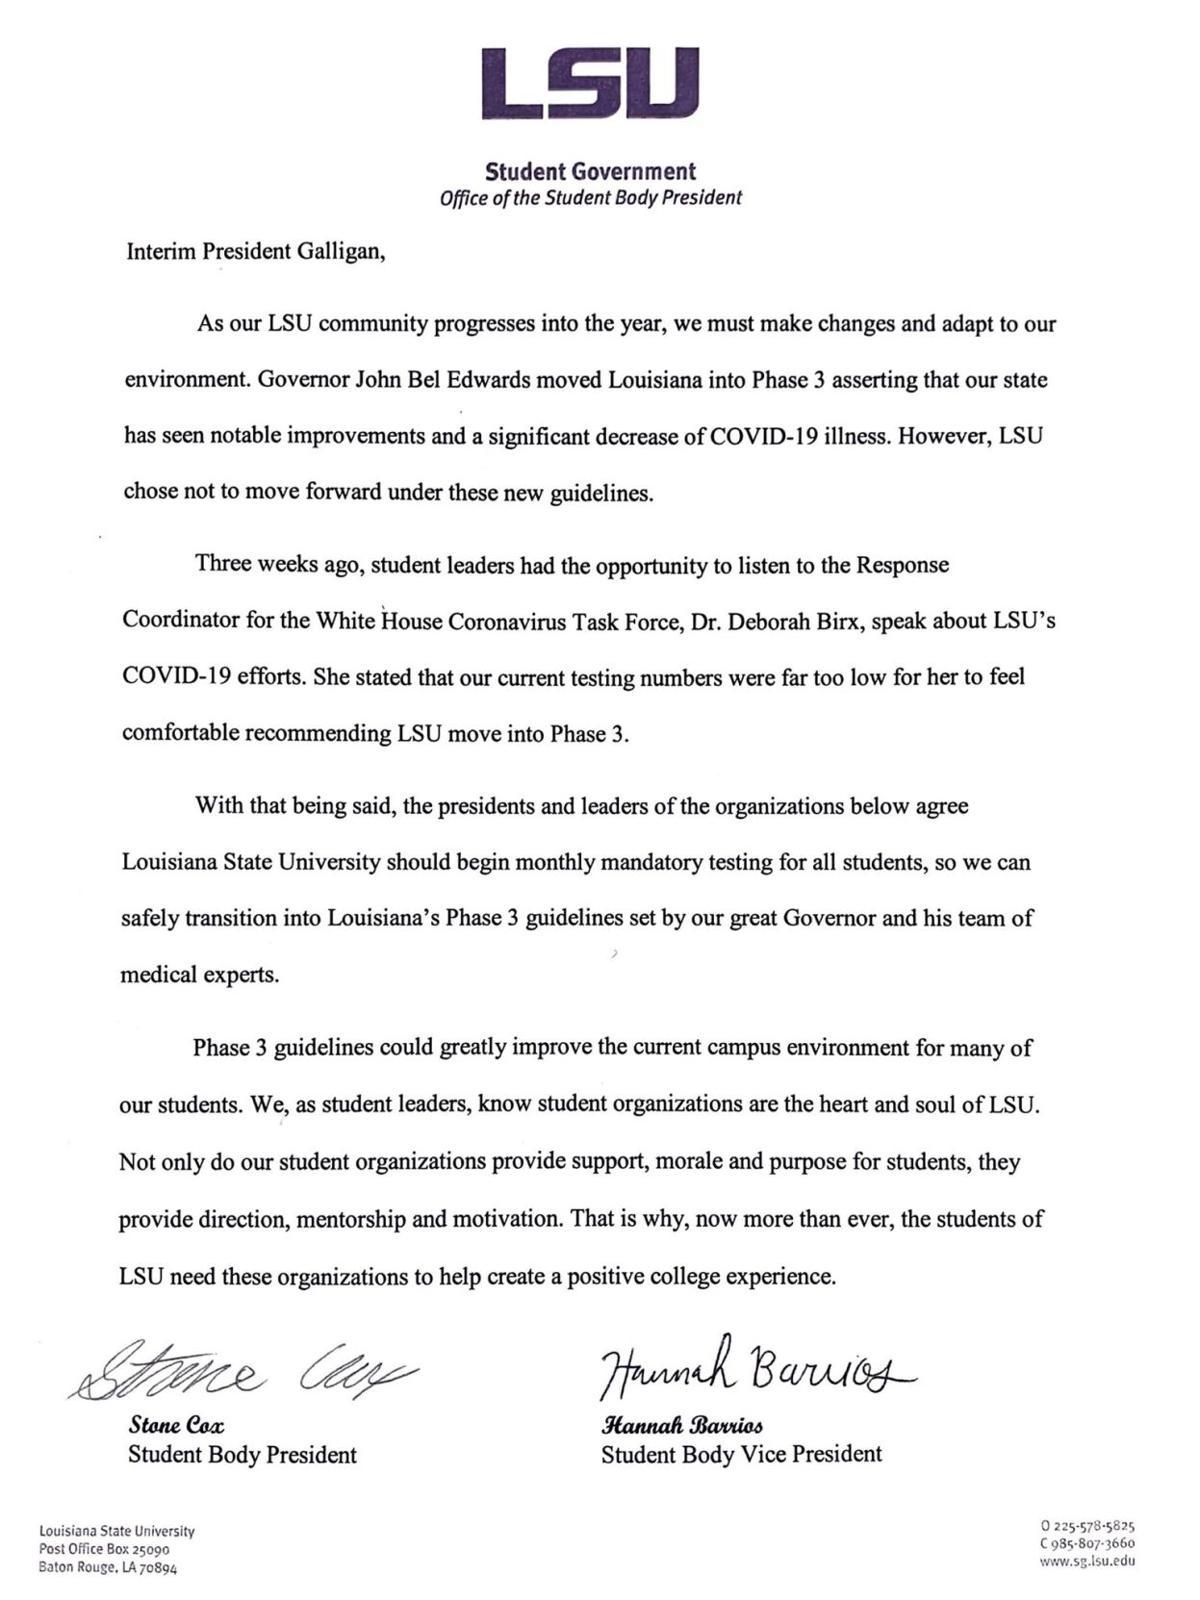 LSU Student Body President Letter